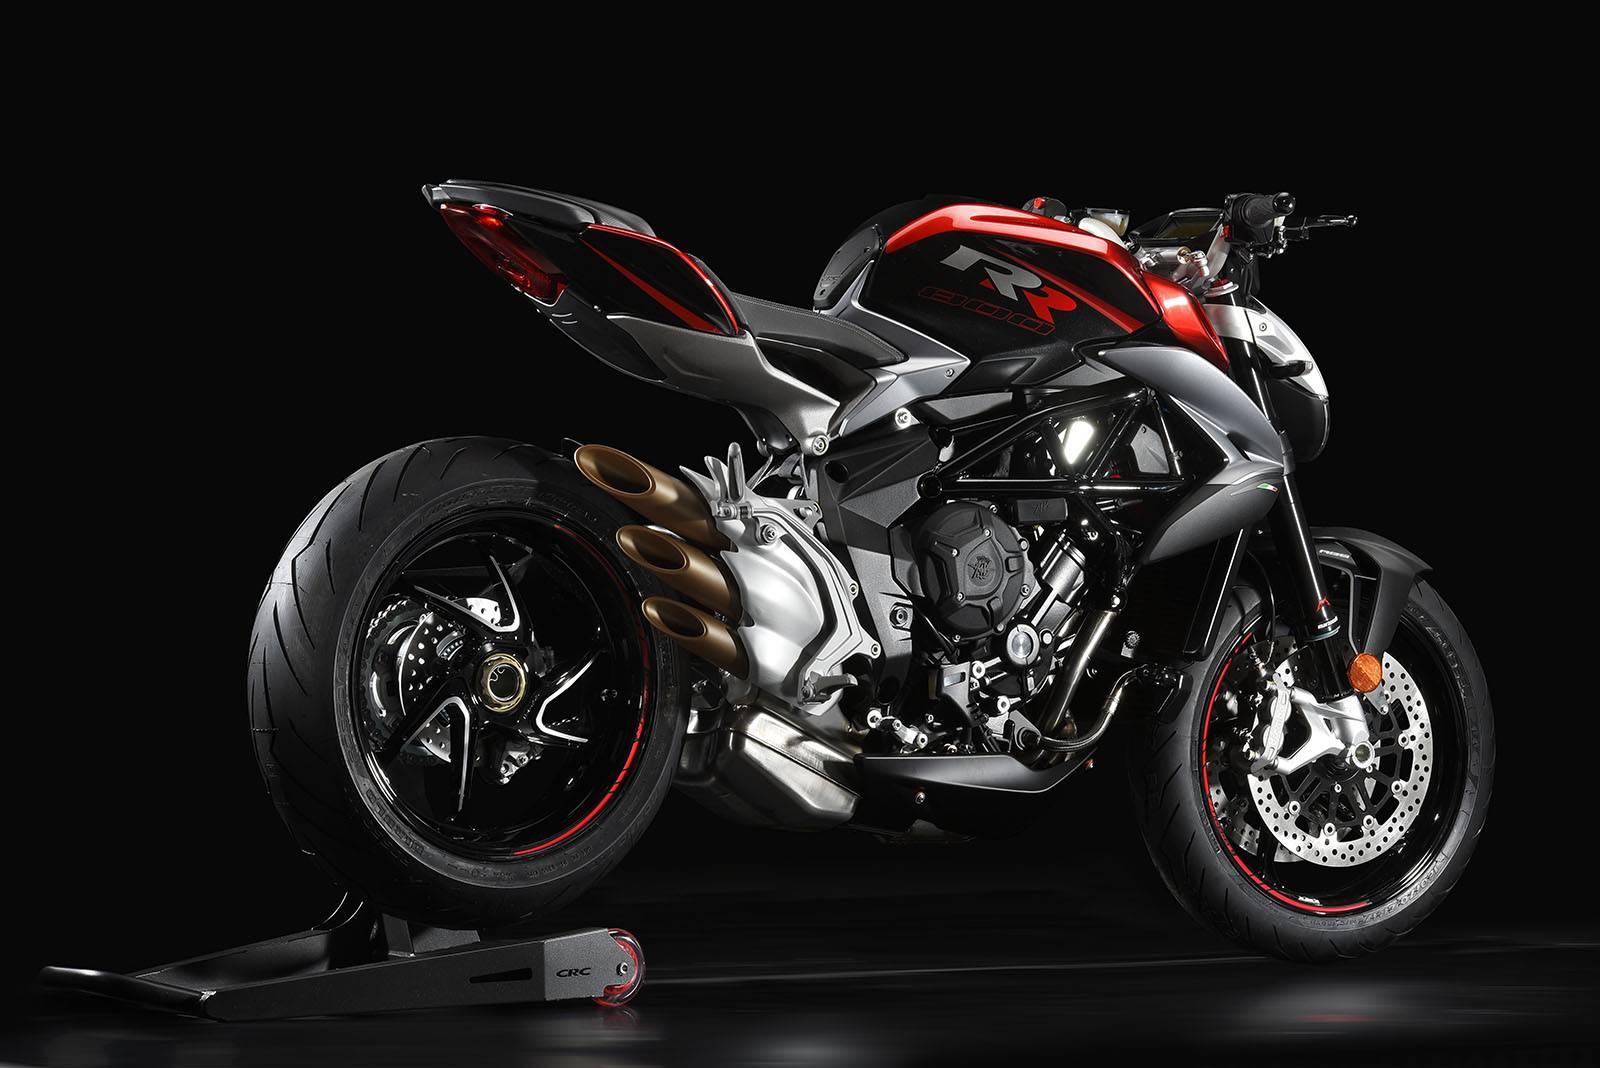 New 2018 MV Agusta Brutale RR Motorcycles in Marietta ed3e4bdb590